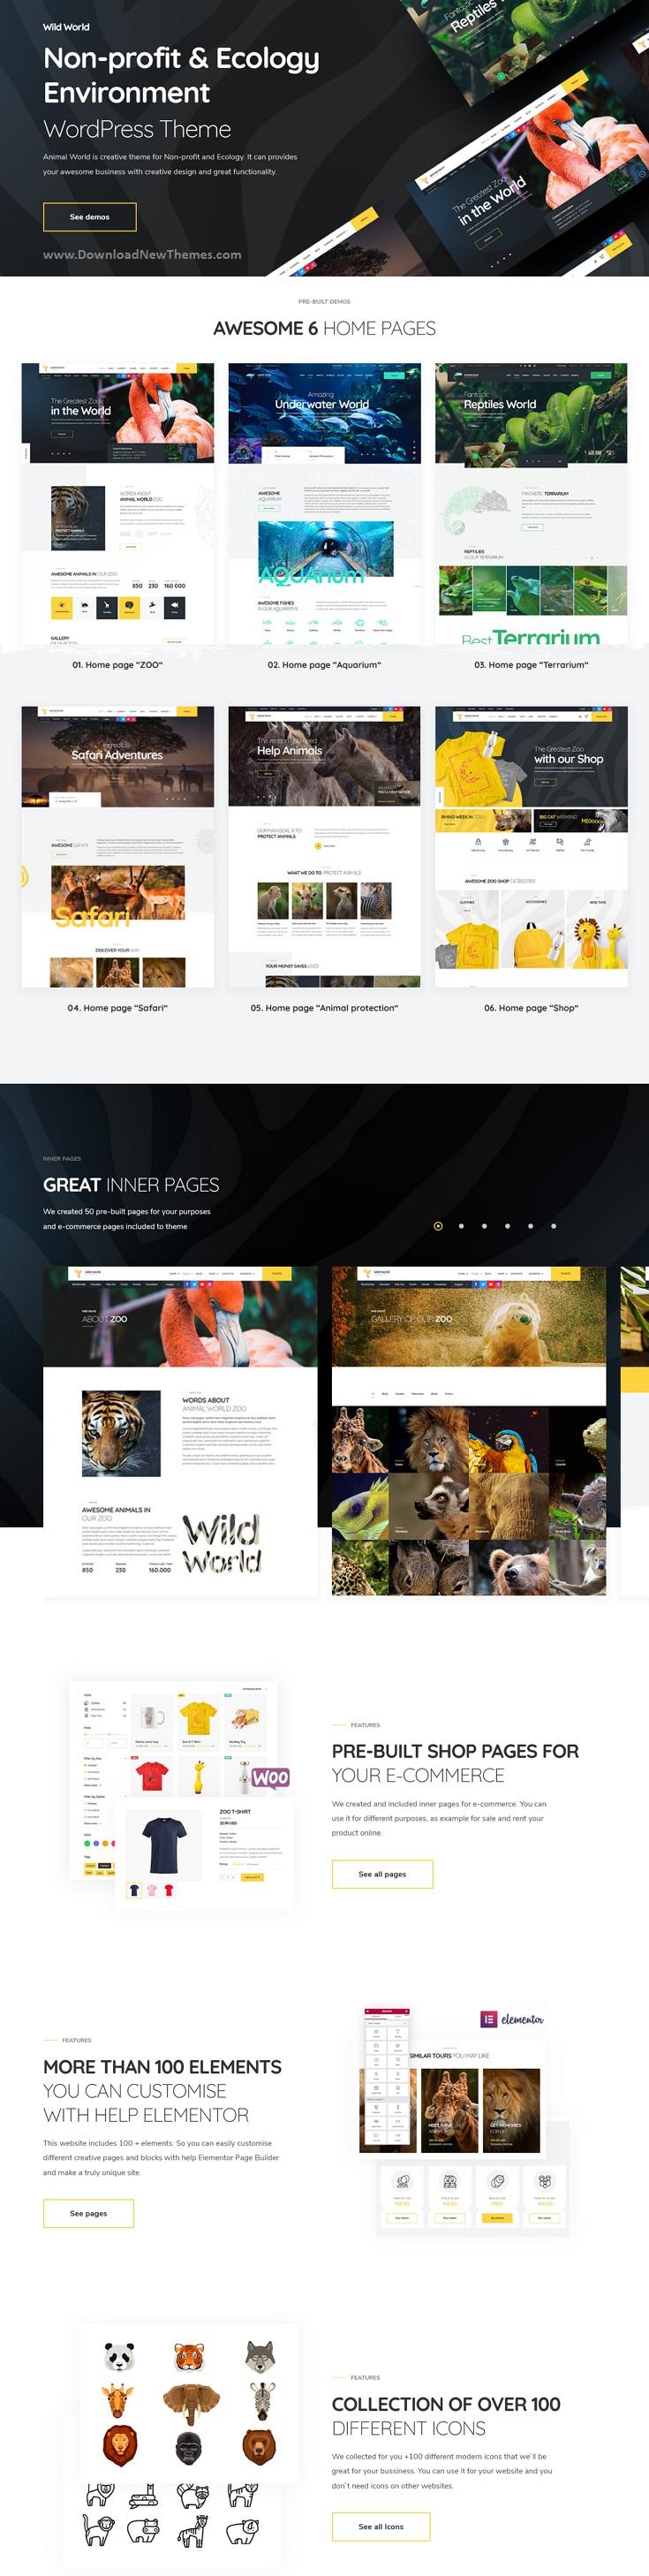 Nonprofit and Ecology WordPress Theme